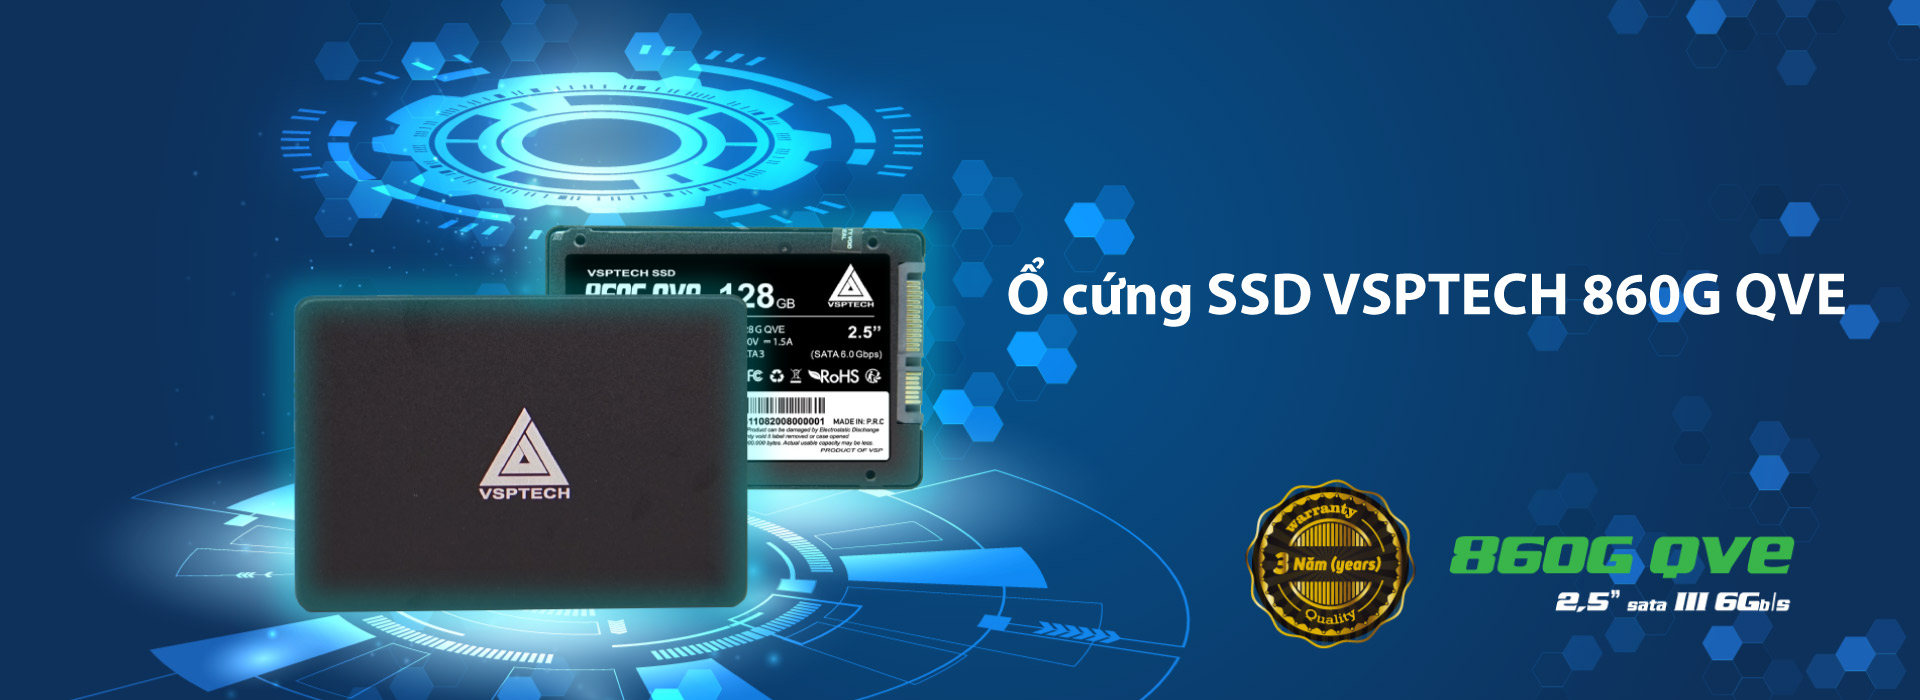 Ổ cứng SSD VSPTECH 860G QVE